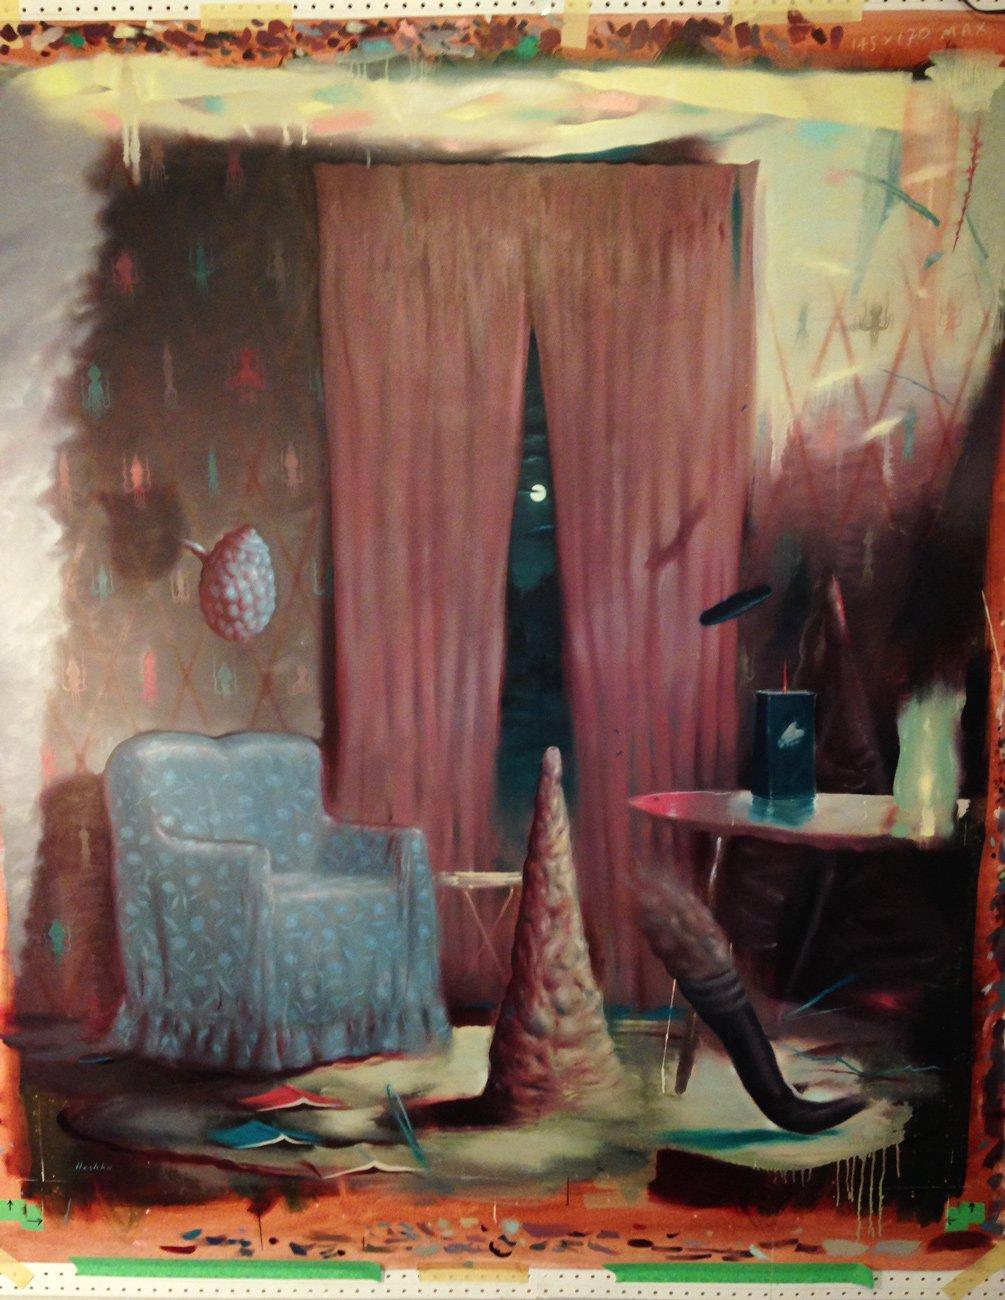 Ryan Heshka - Flies Have Ghosts